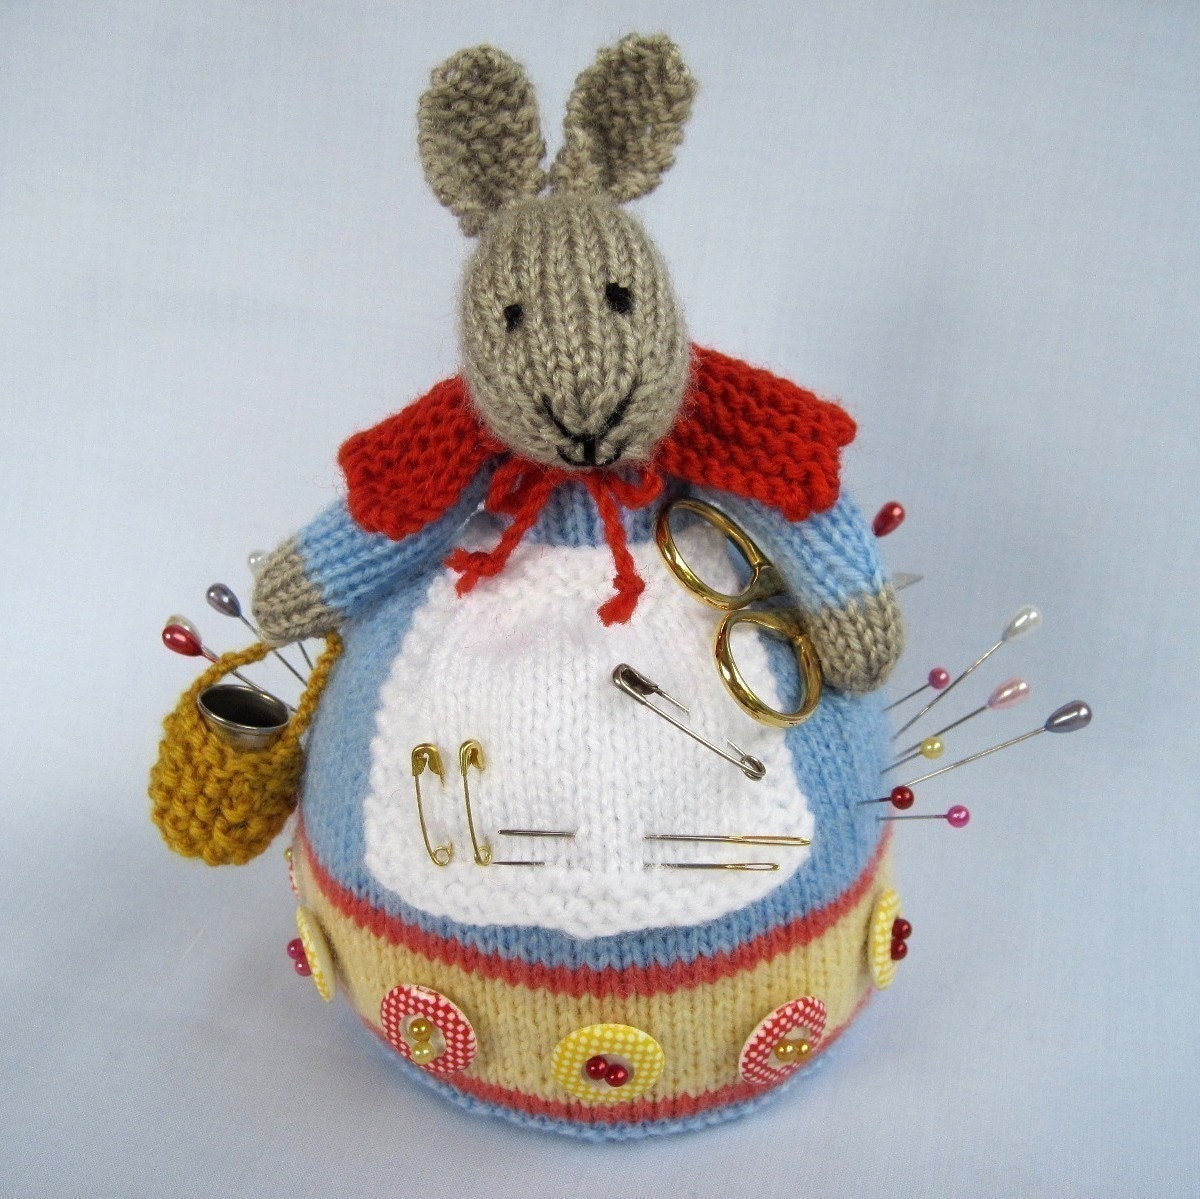 ROWENA خرگوش -- دوخت همراه -- ایمیل اف بافندگی الگوی